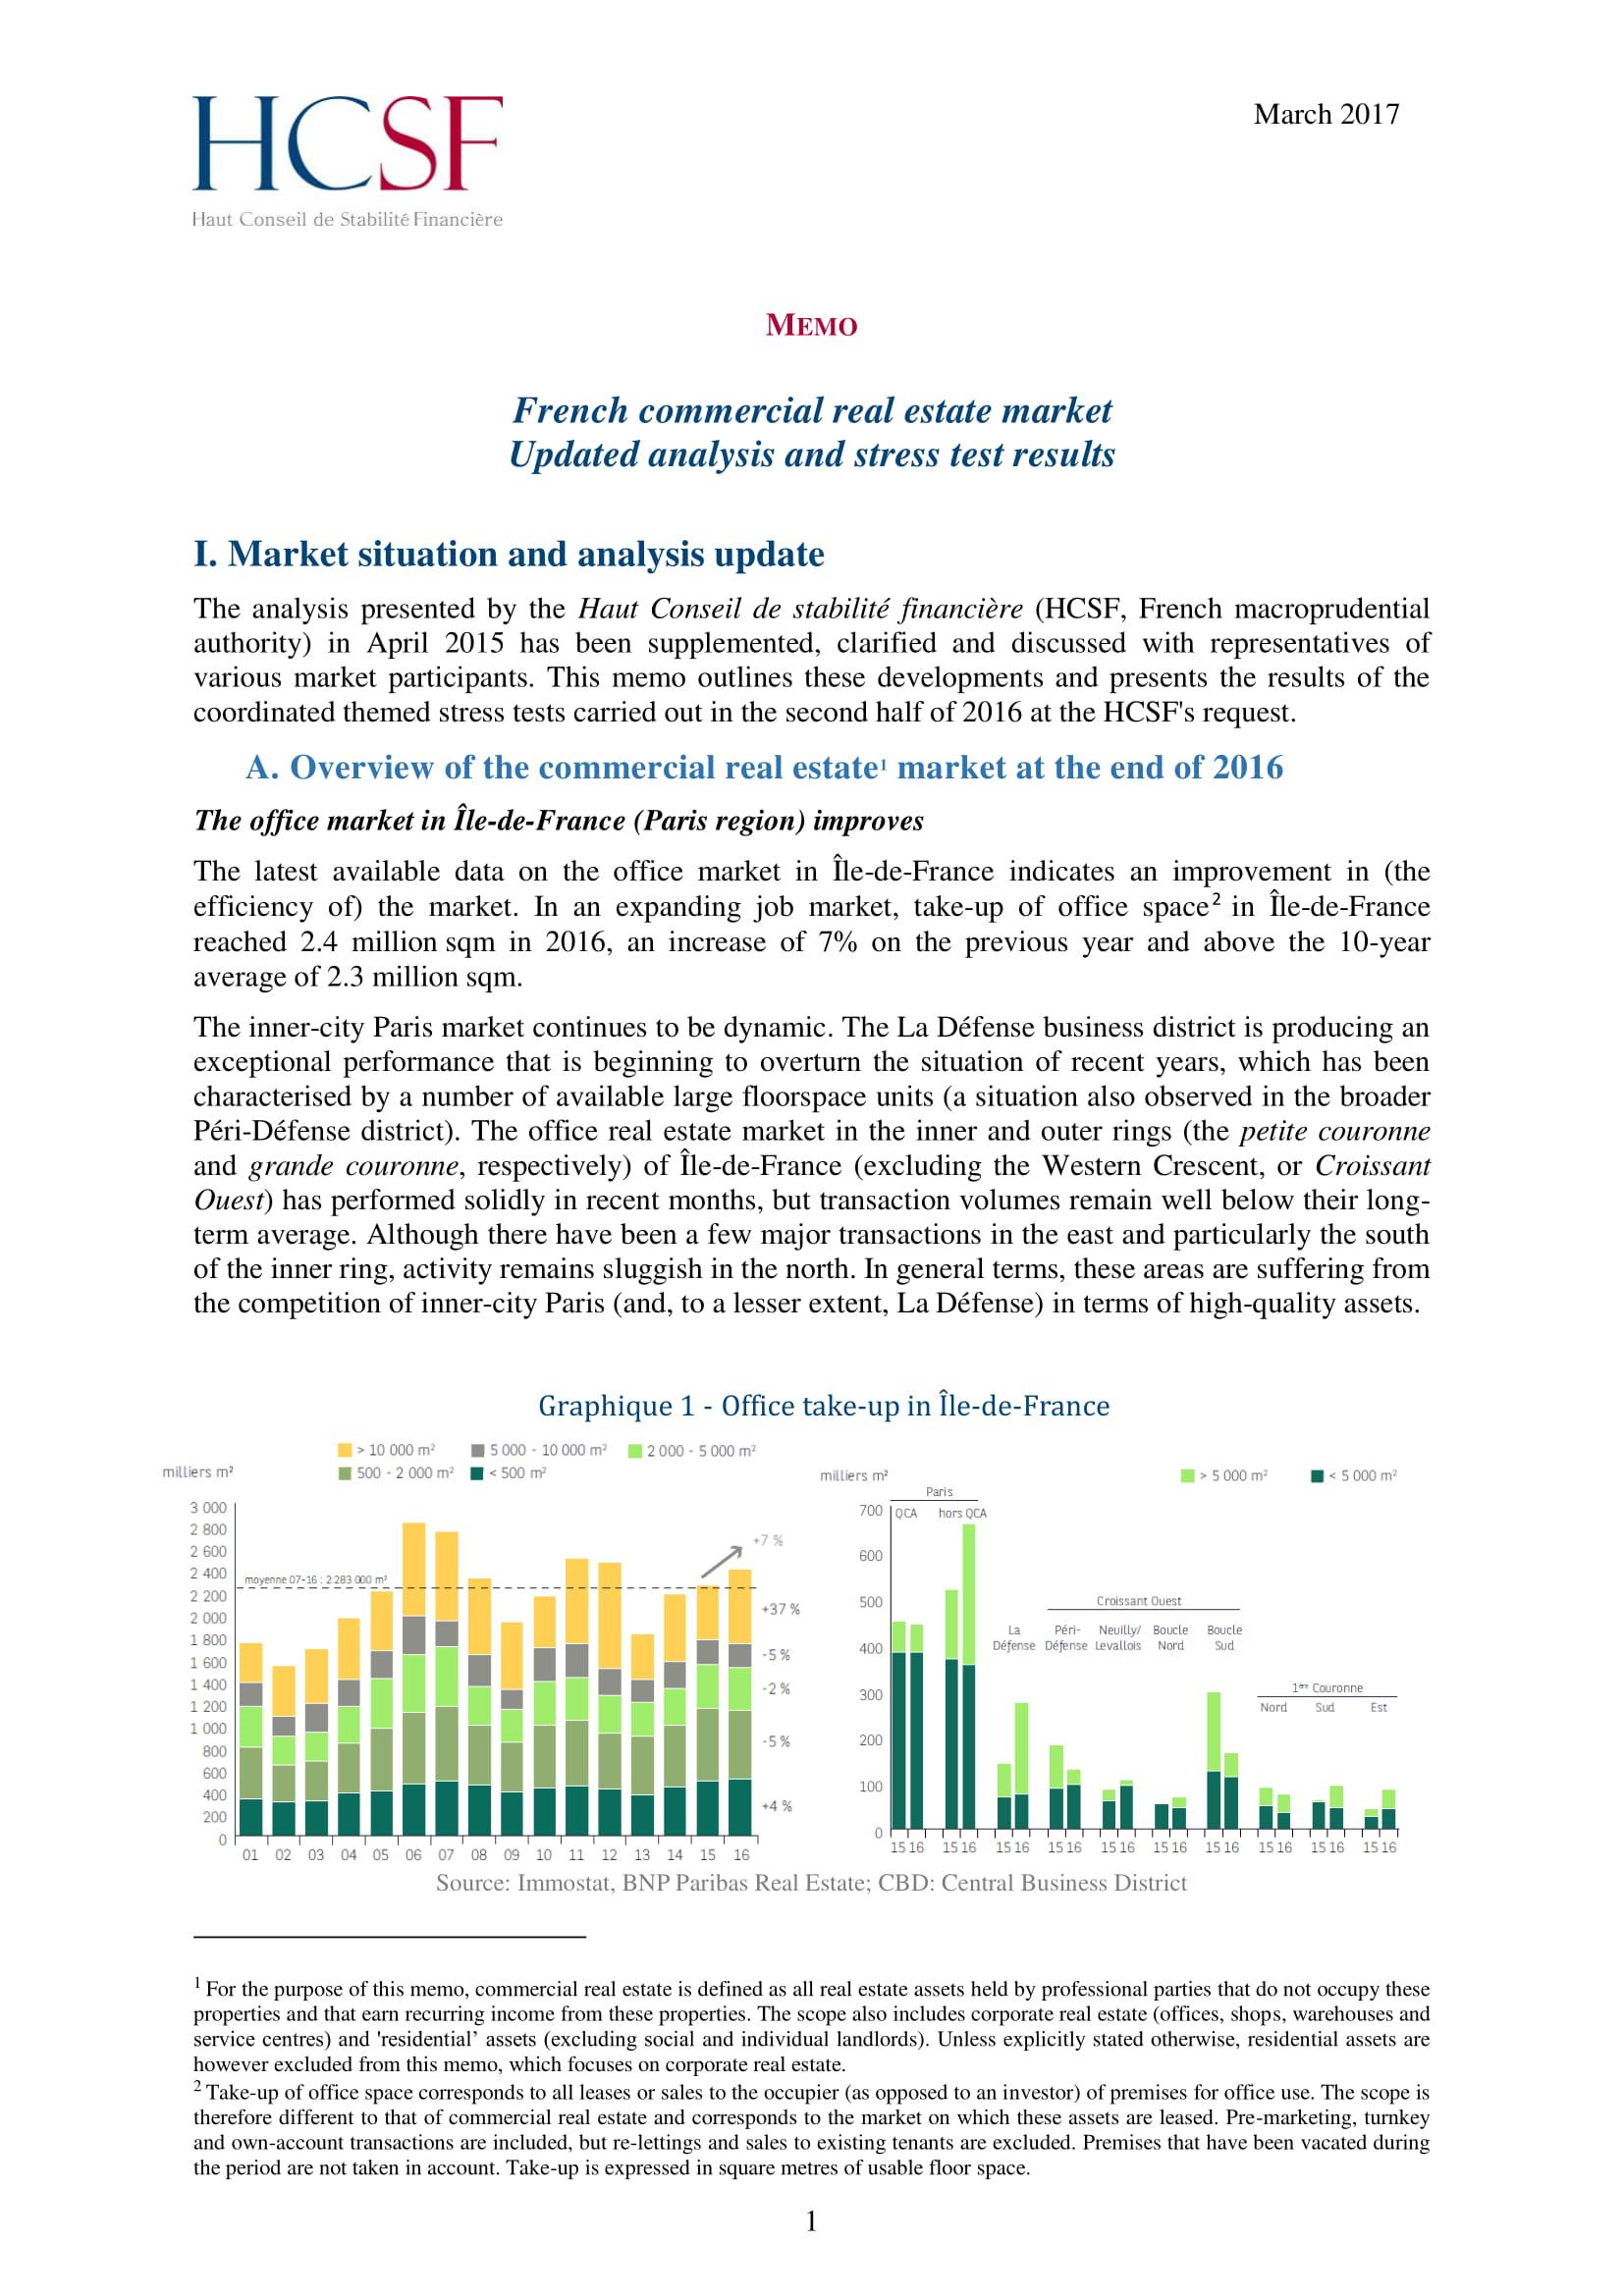 8+ Real Estate Market Analysis Templates - PDF | Free & Premium ...